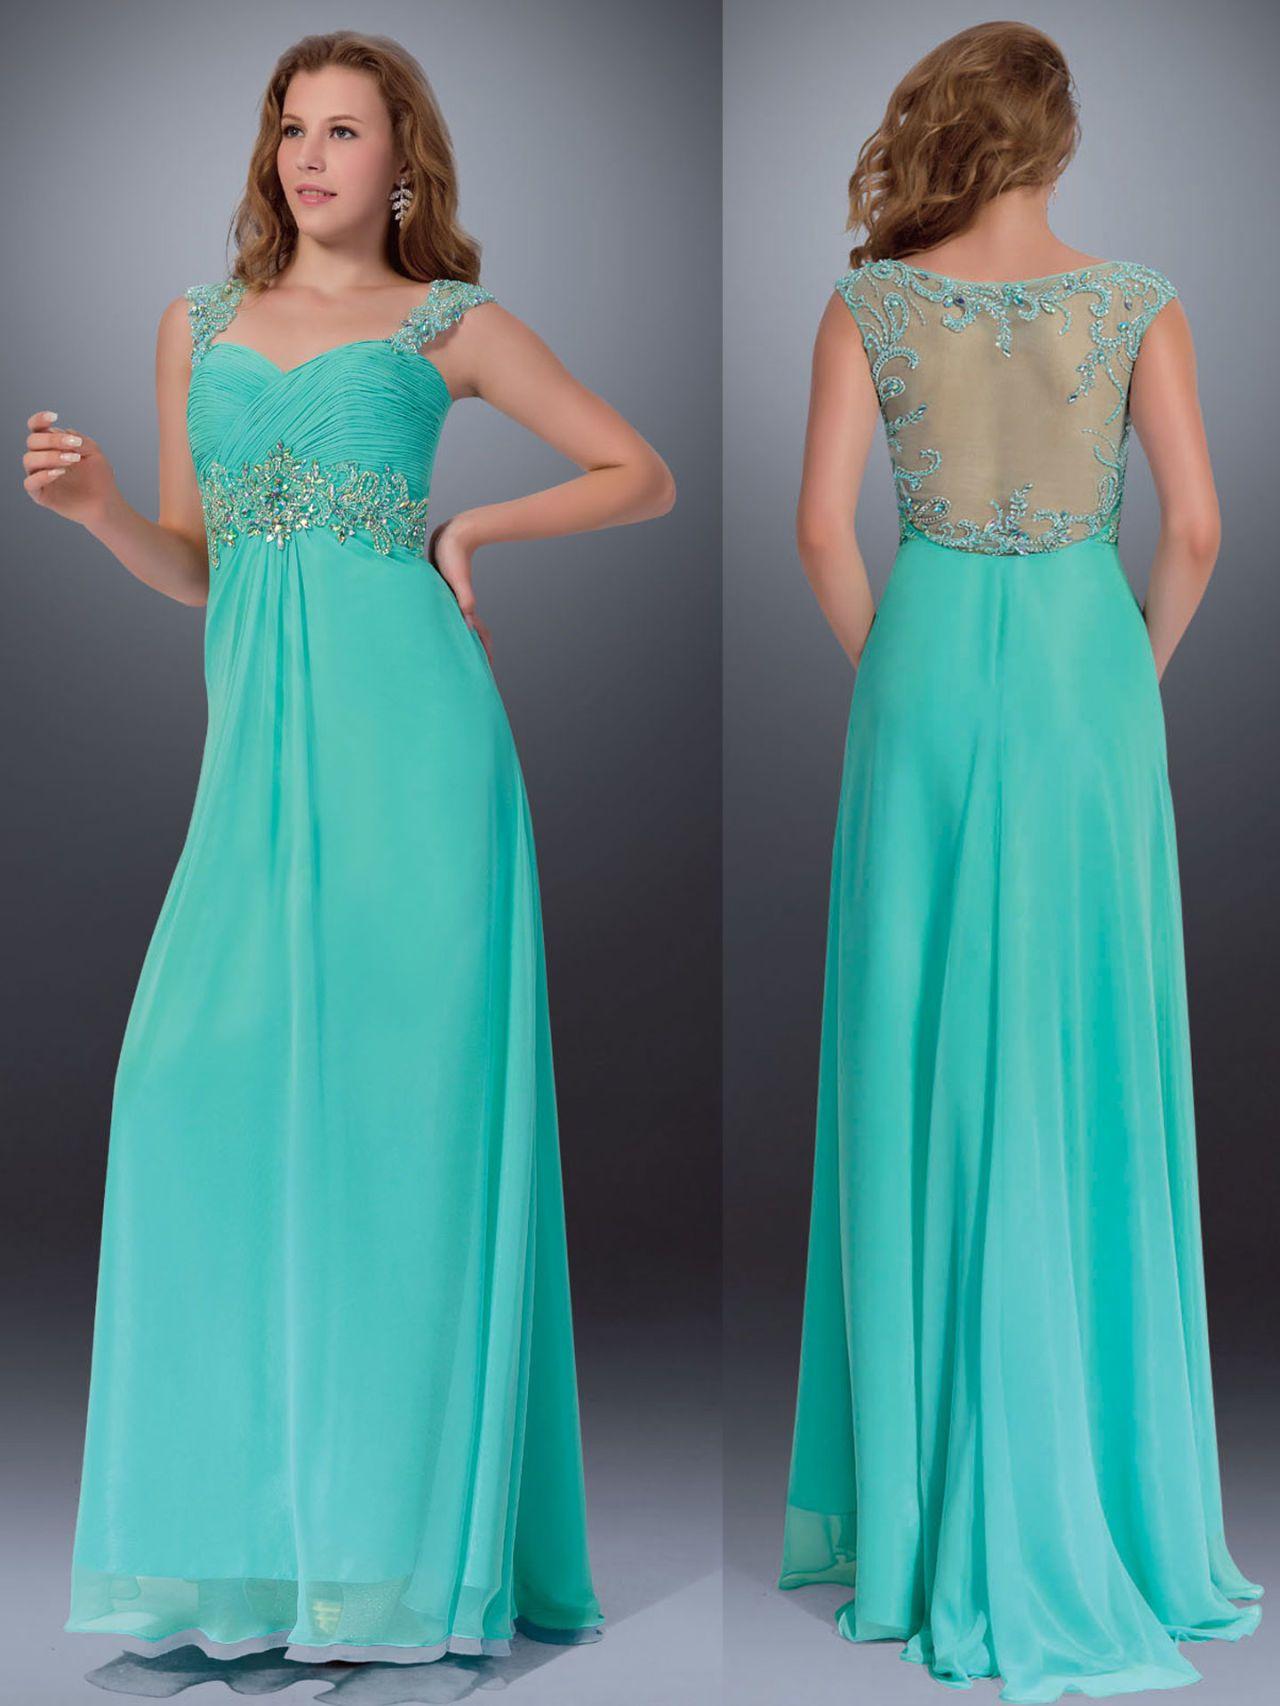 Green Prom Dresses - Prom Dress Trends 2014